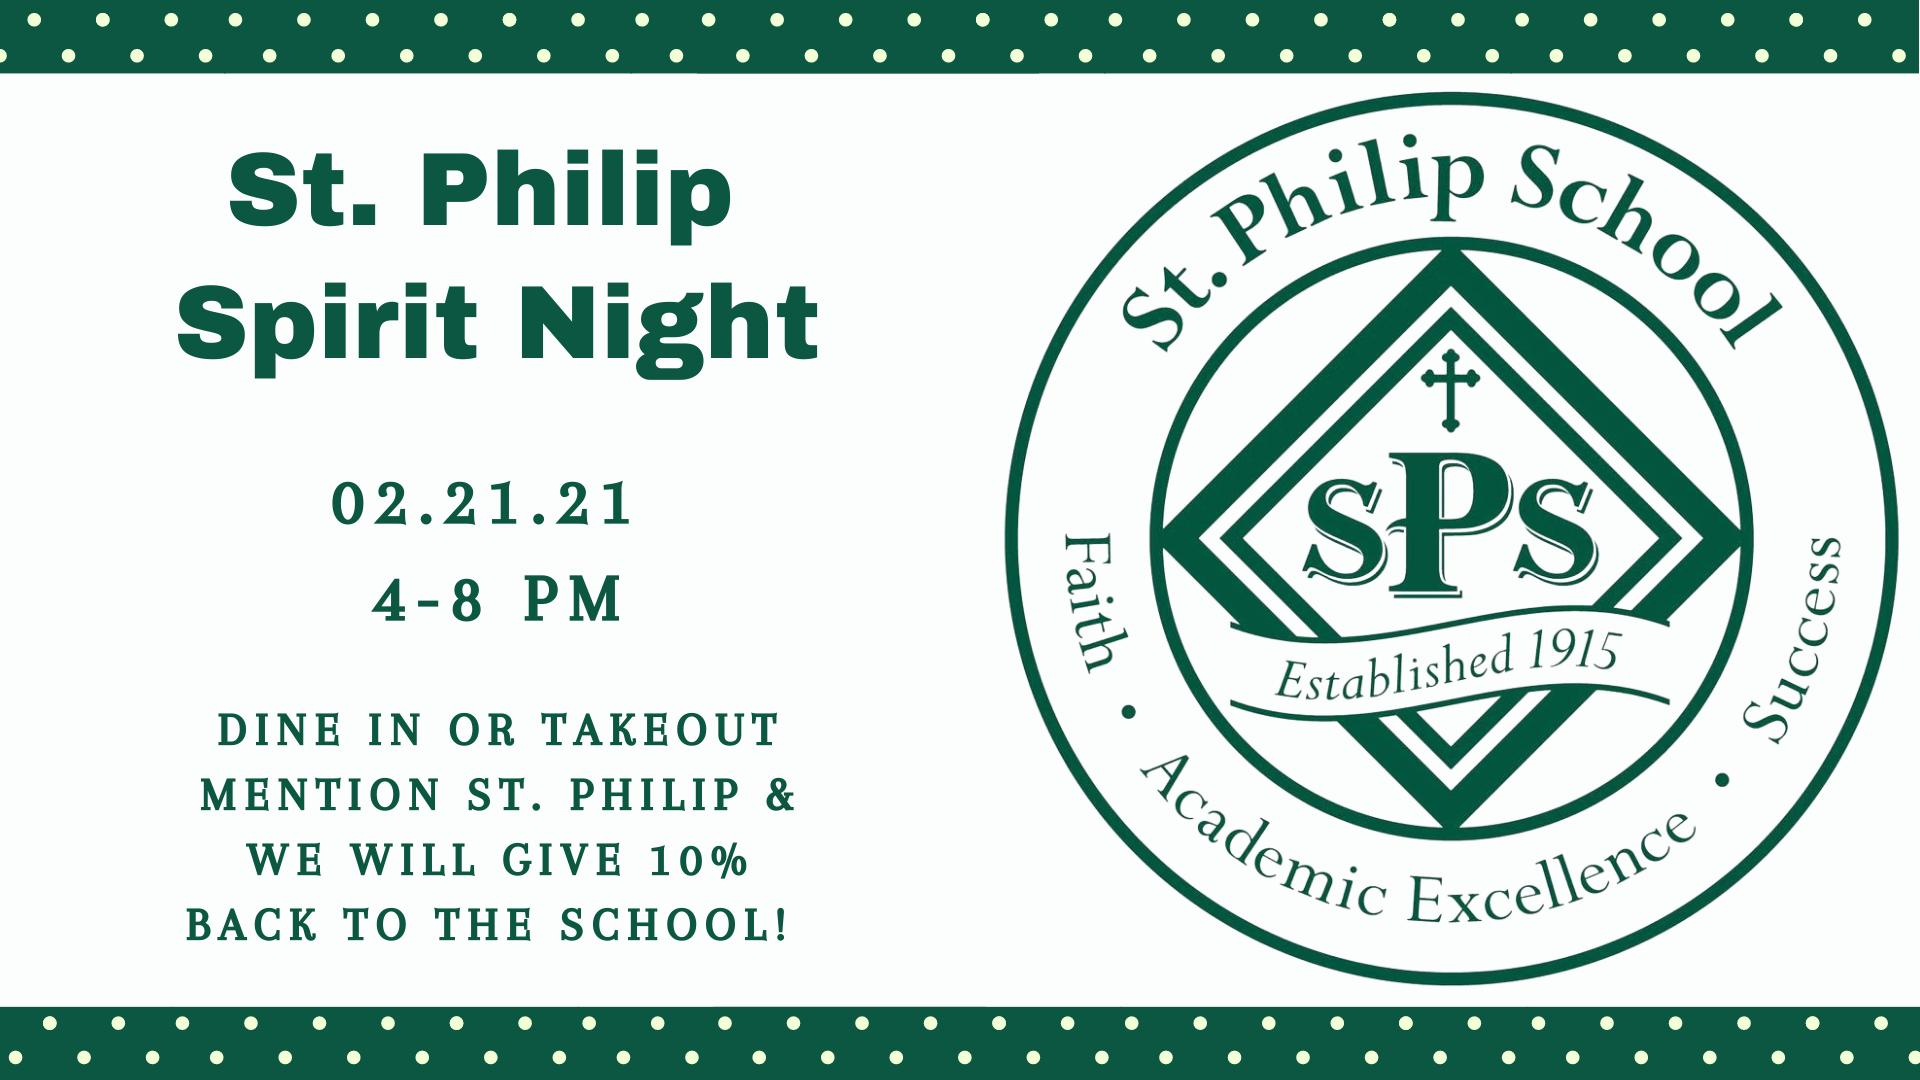 St. Philip Spirit Night